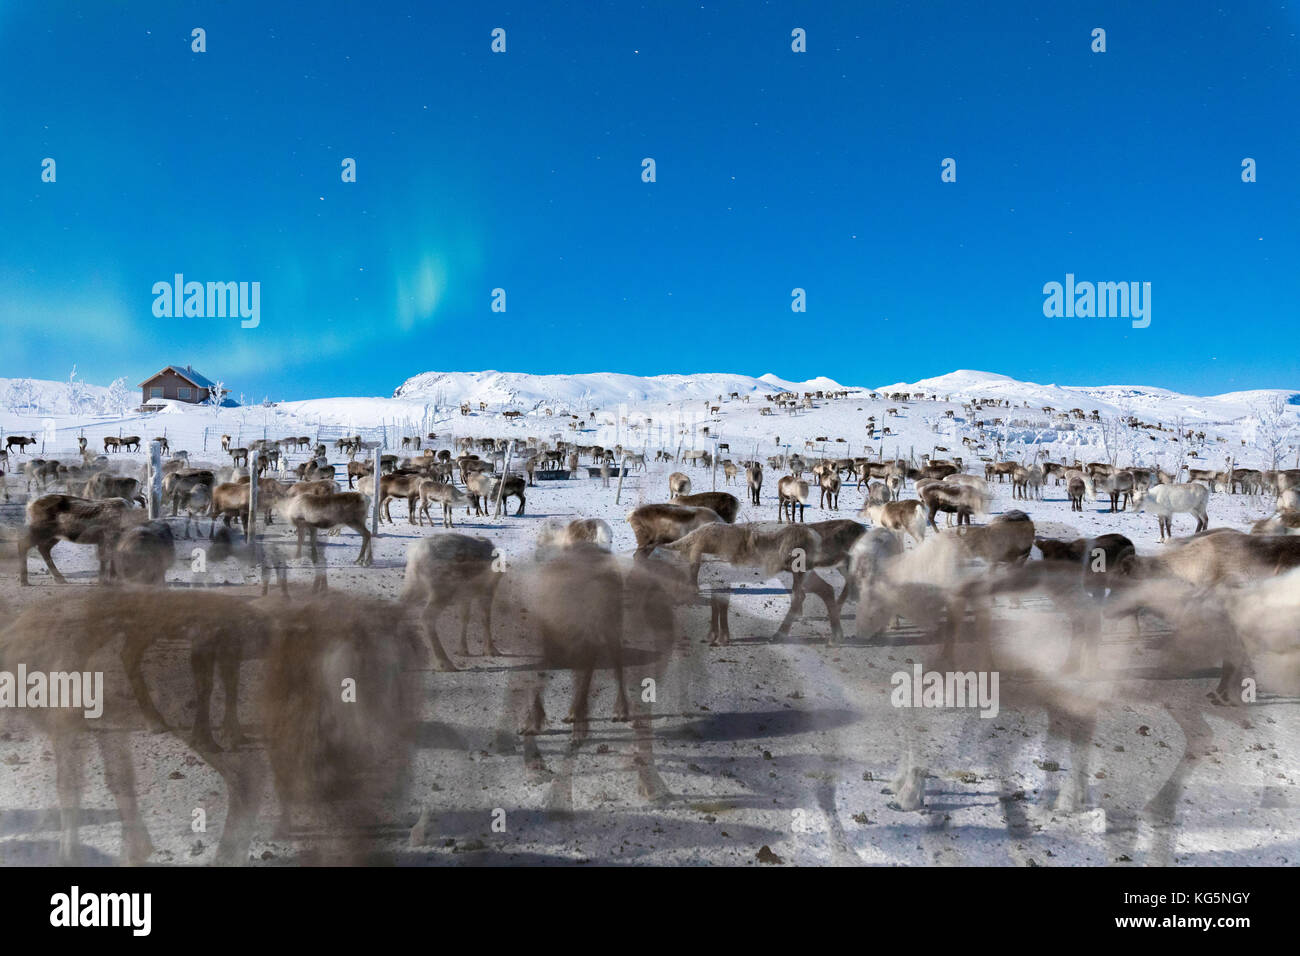 Flock of reindeer under Northern Lights, Abisko, Kiruna Municipality, Norrbotten County, Lapland, Sweden - Stock Image